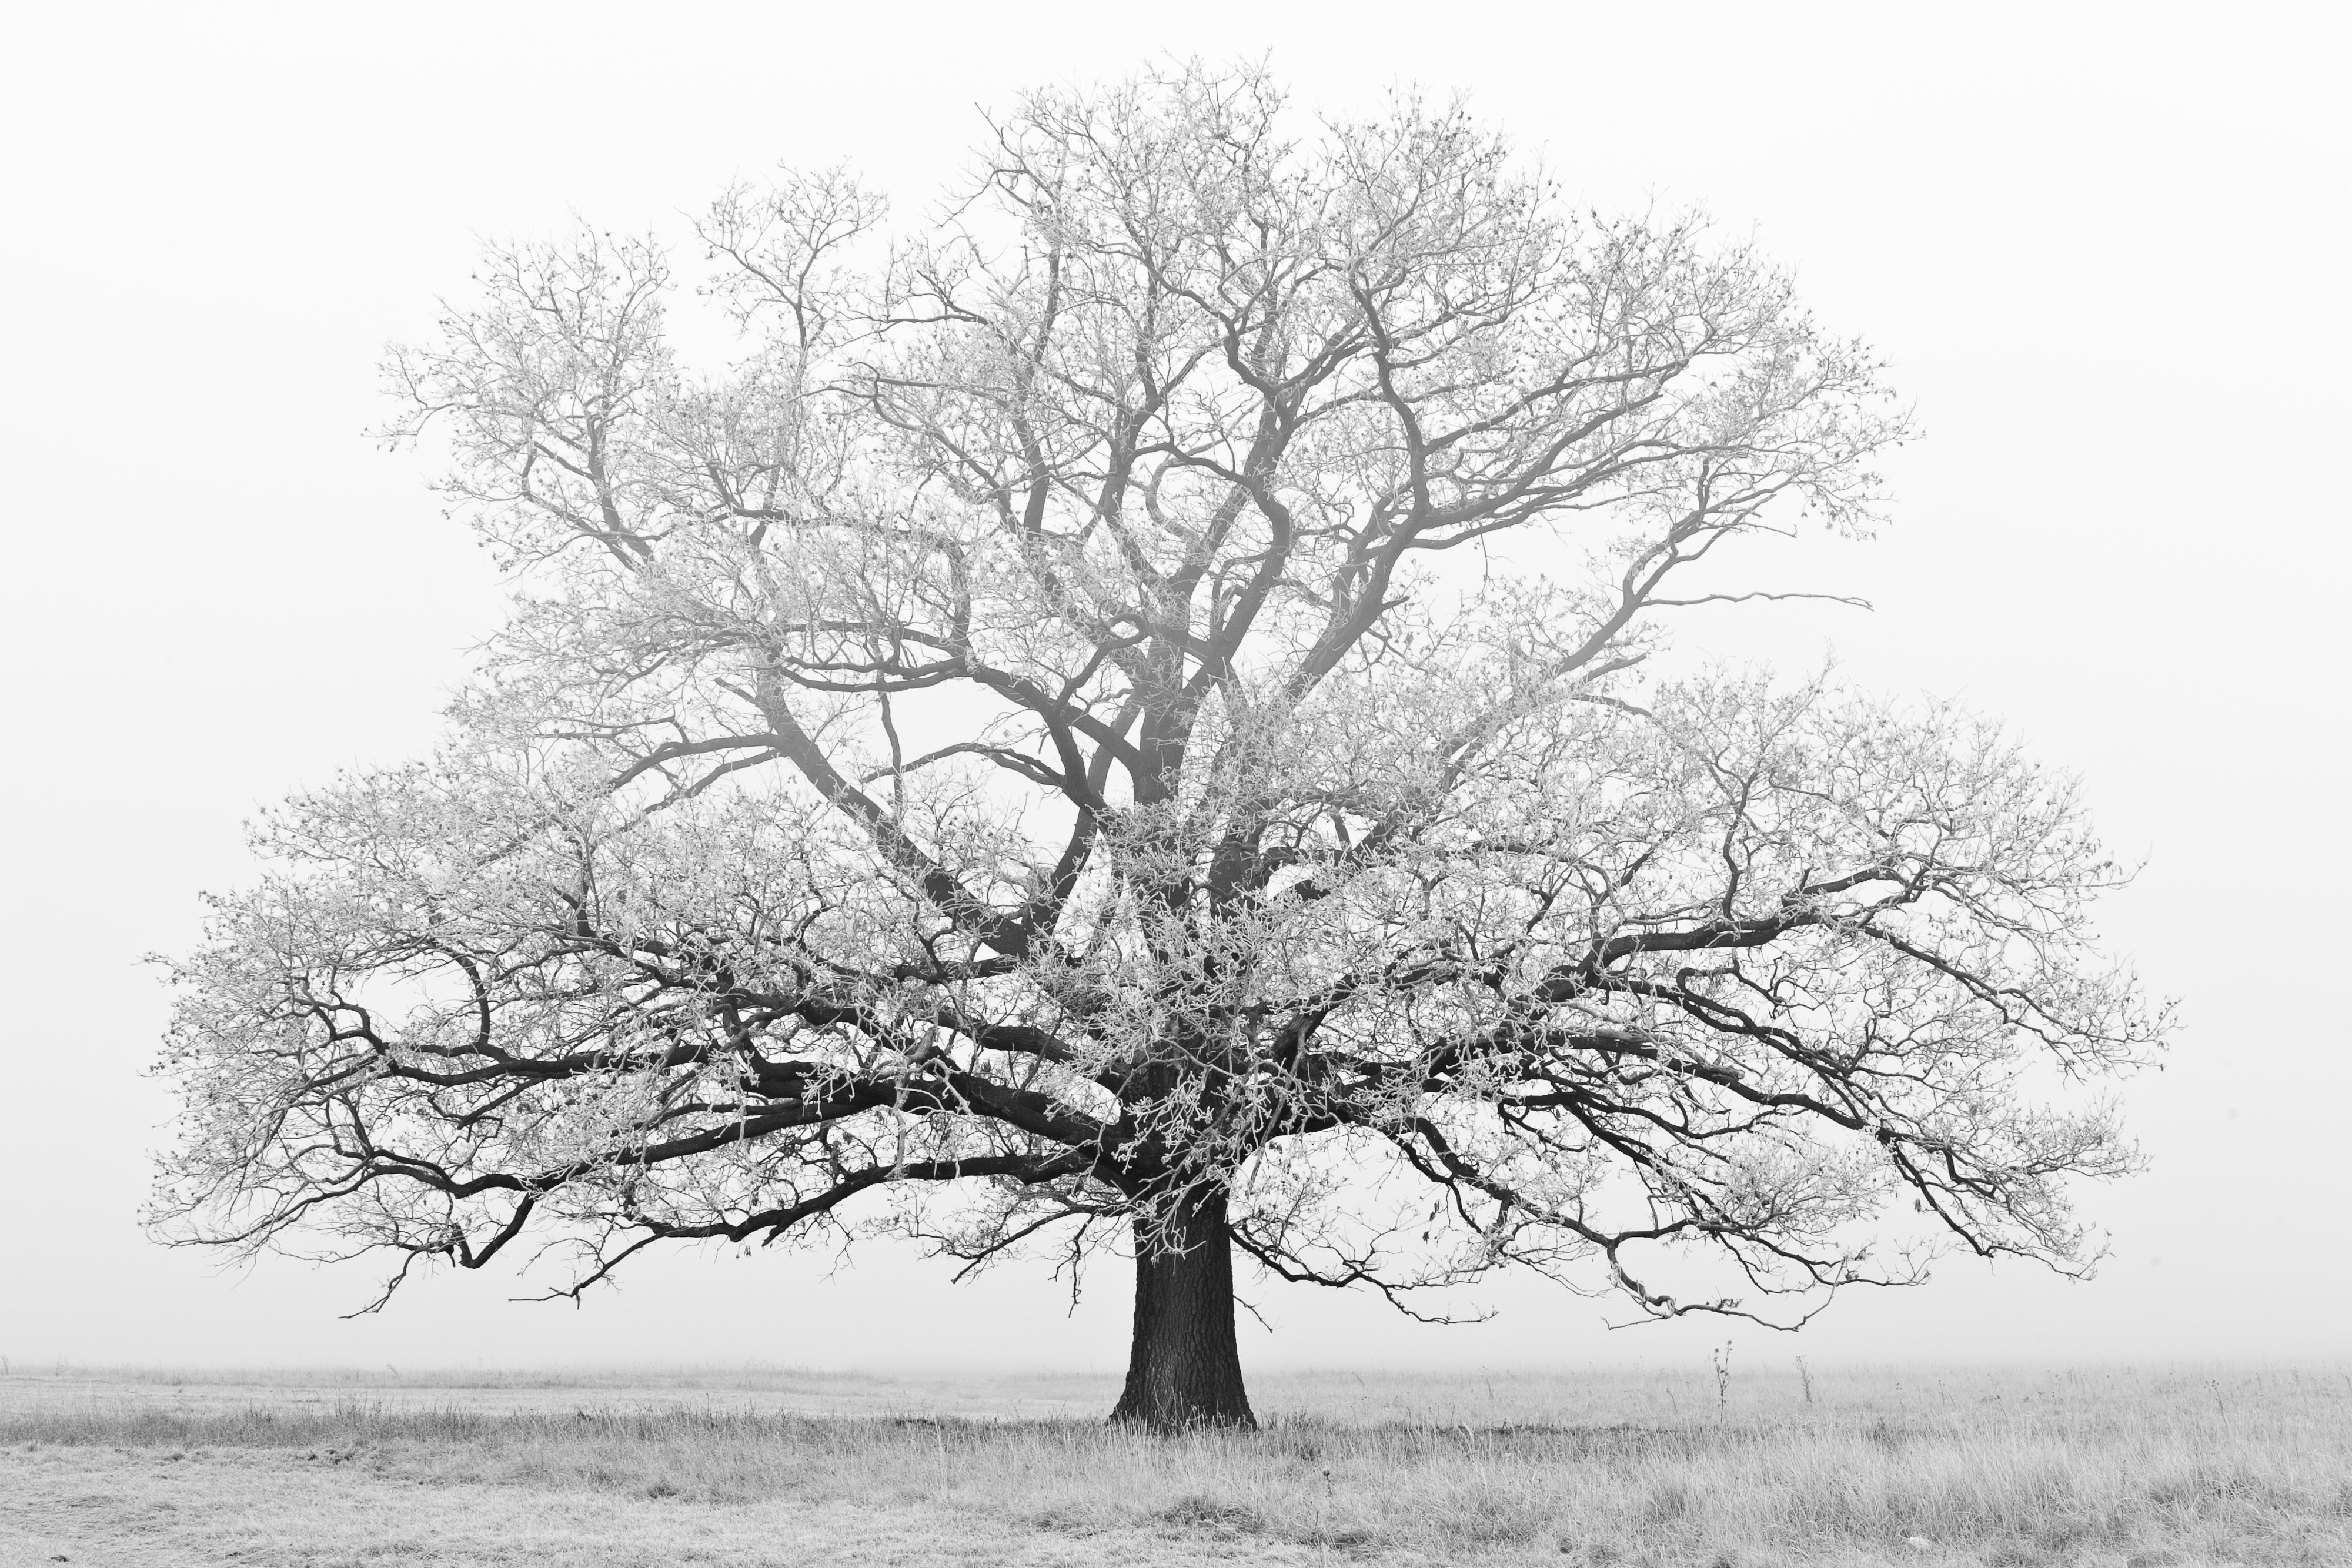 Winter Tree | Free Photo Winter Tree White Winter Tree Free Download Jooinn